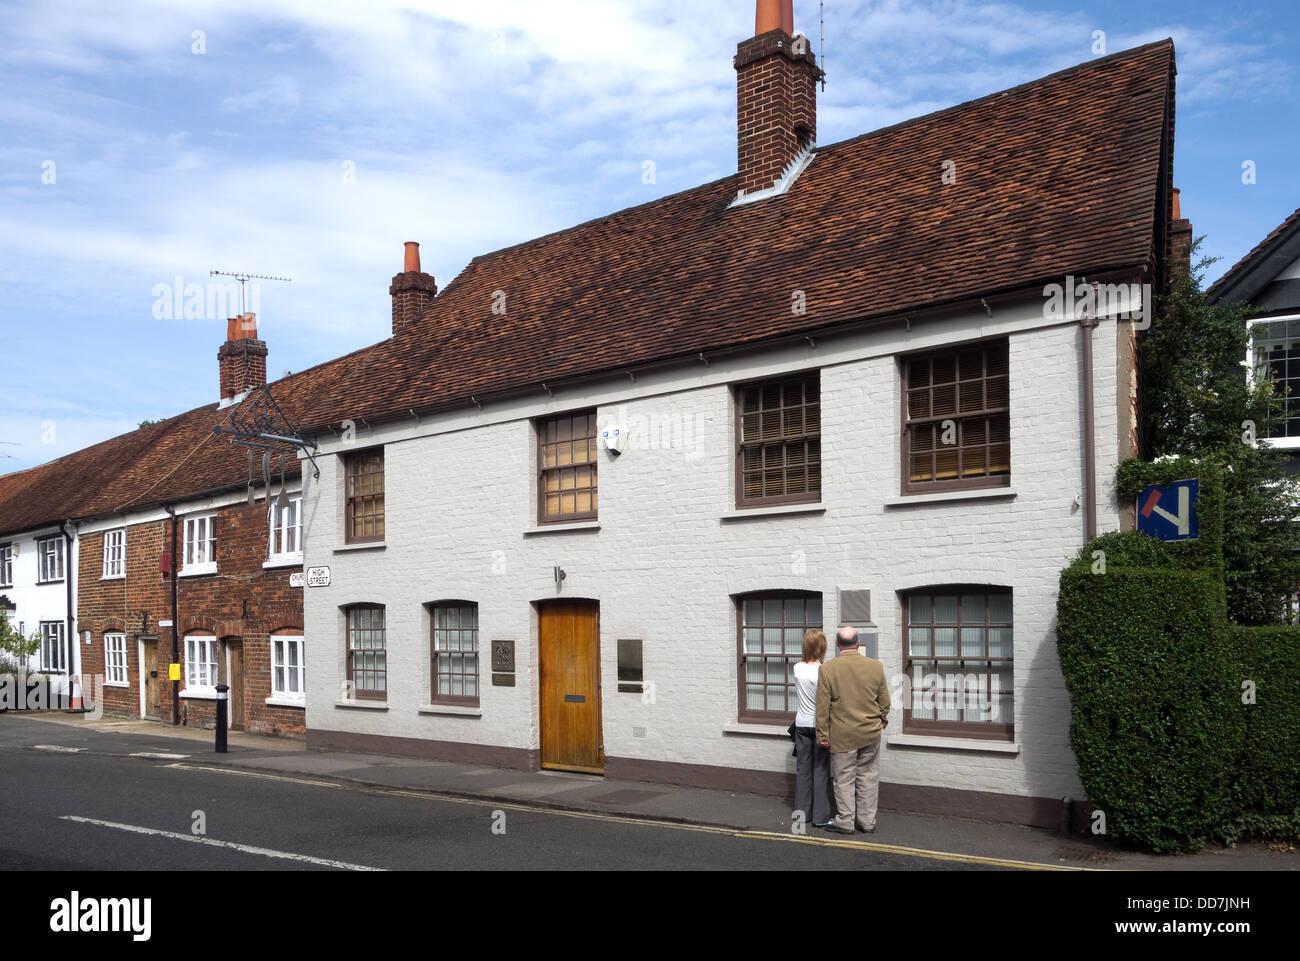 The Fat Duck Restaurant, High Street, Bray, Berkshire -1 Stock Photo